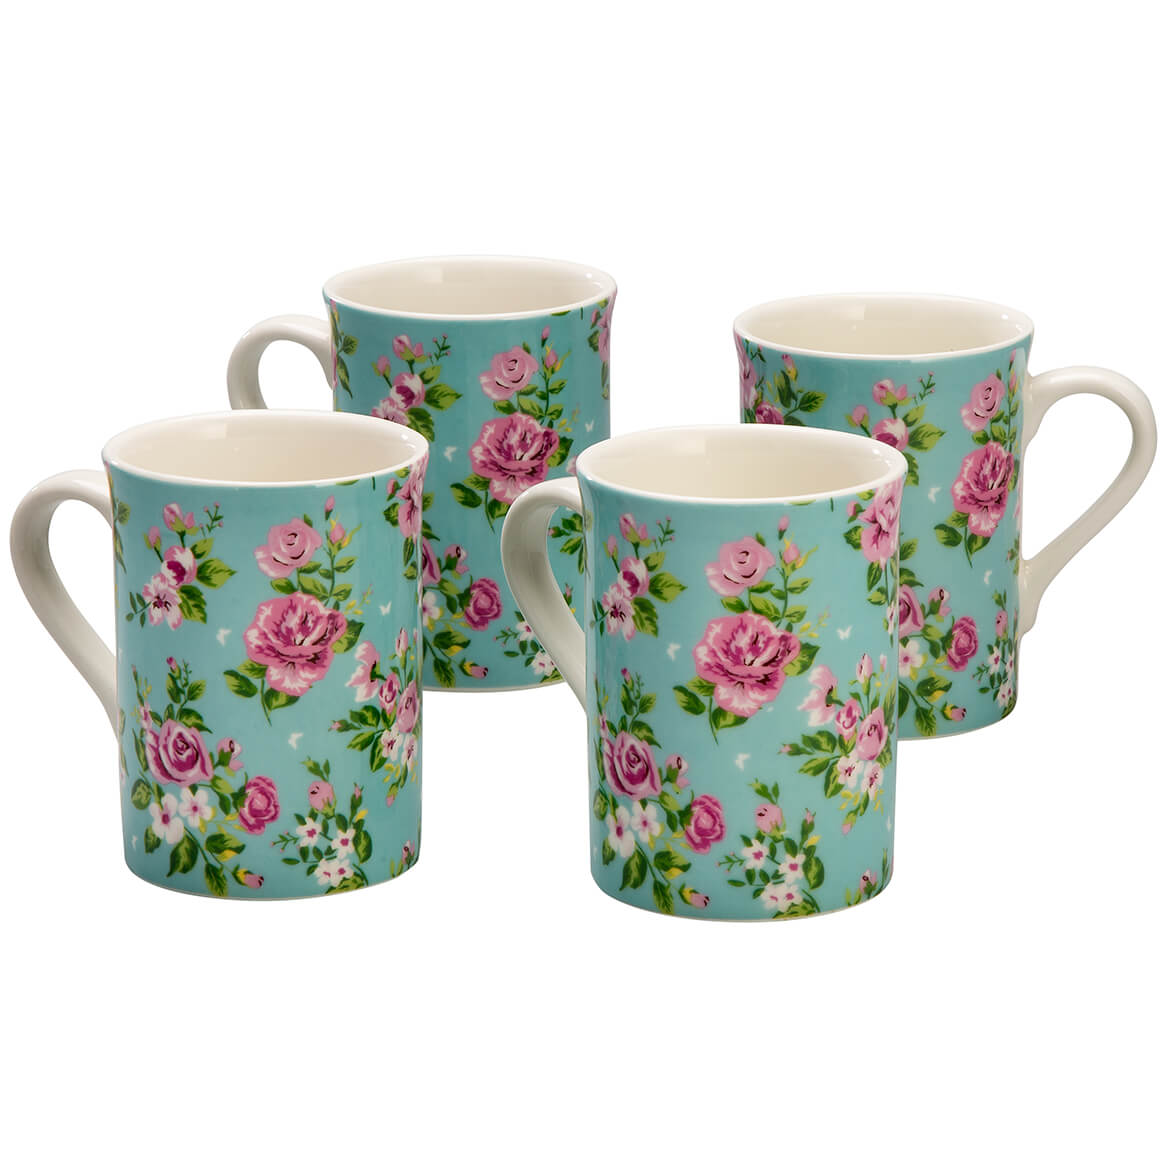 Rose Chintz Mug Set of 4 by William Roberts-368080